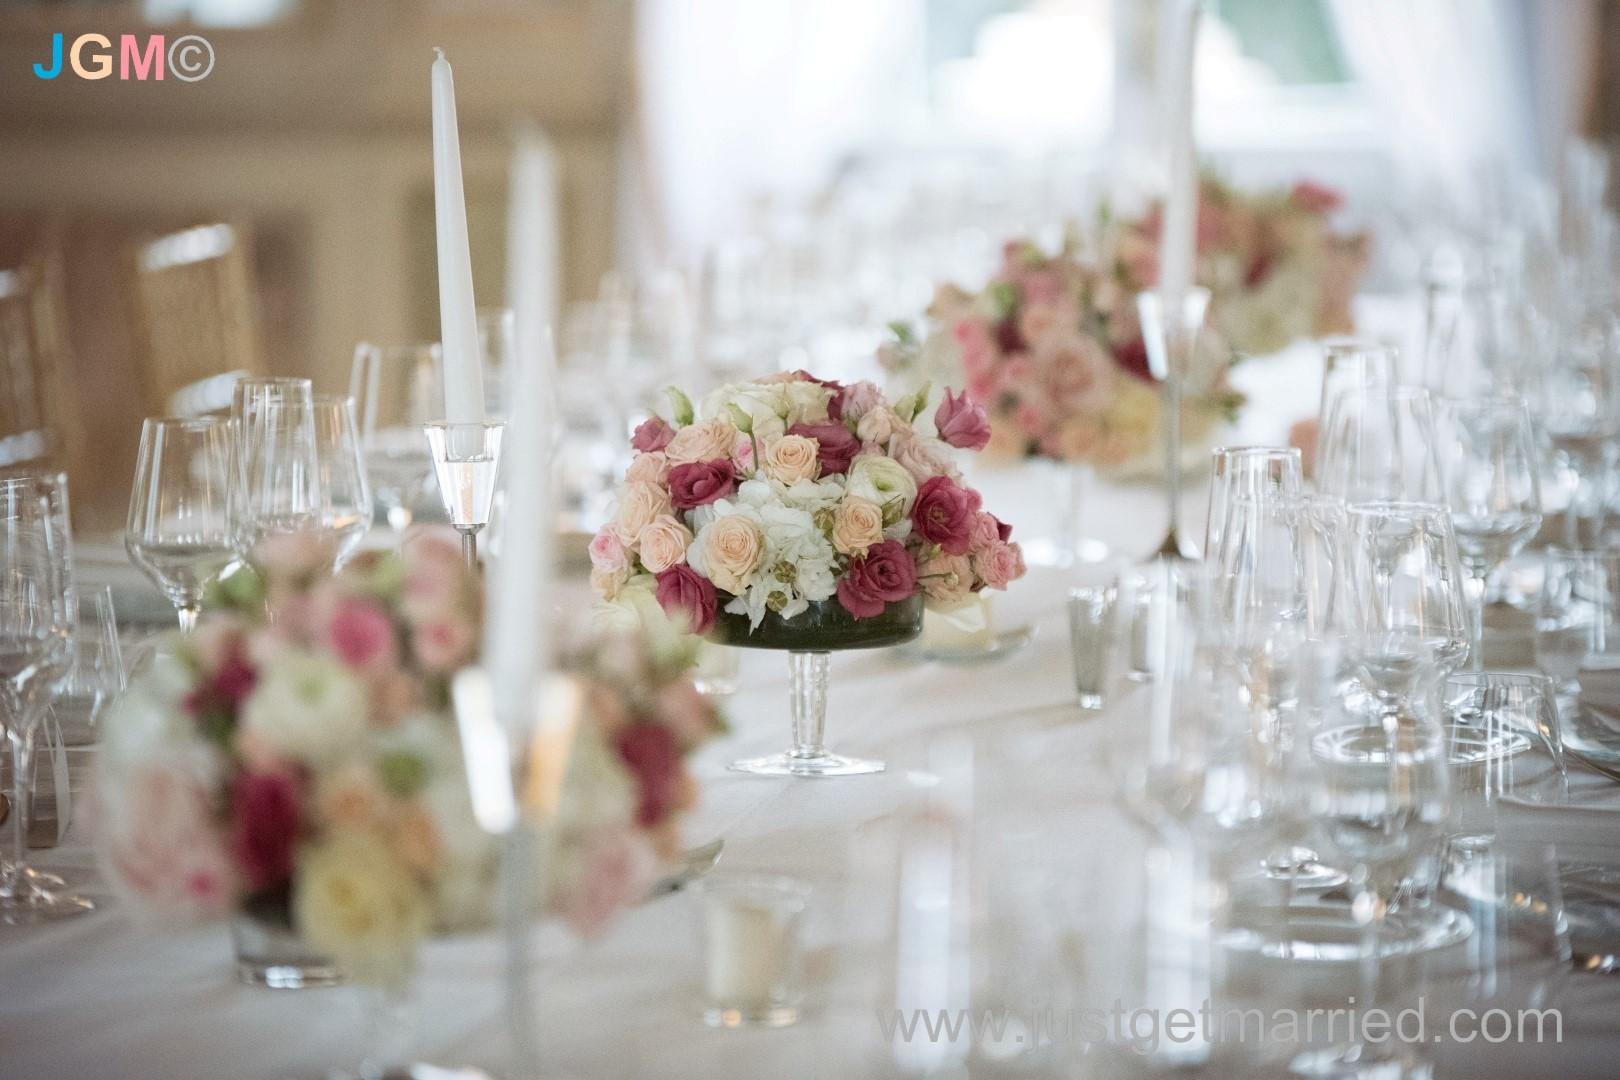 casina valadier reception weddings rome